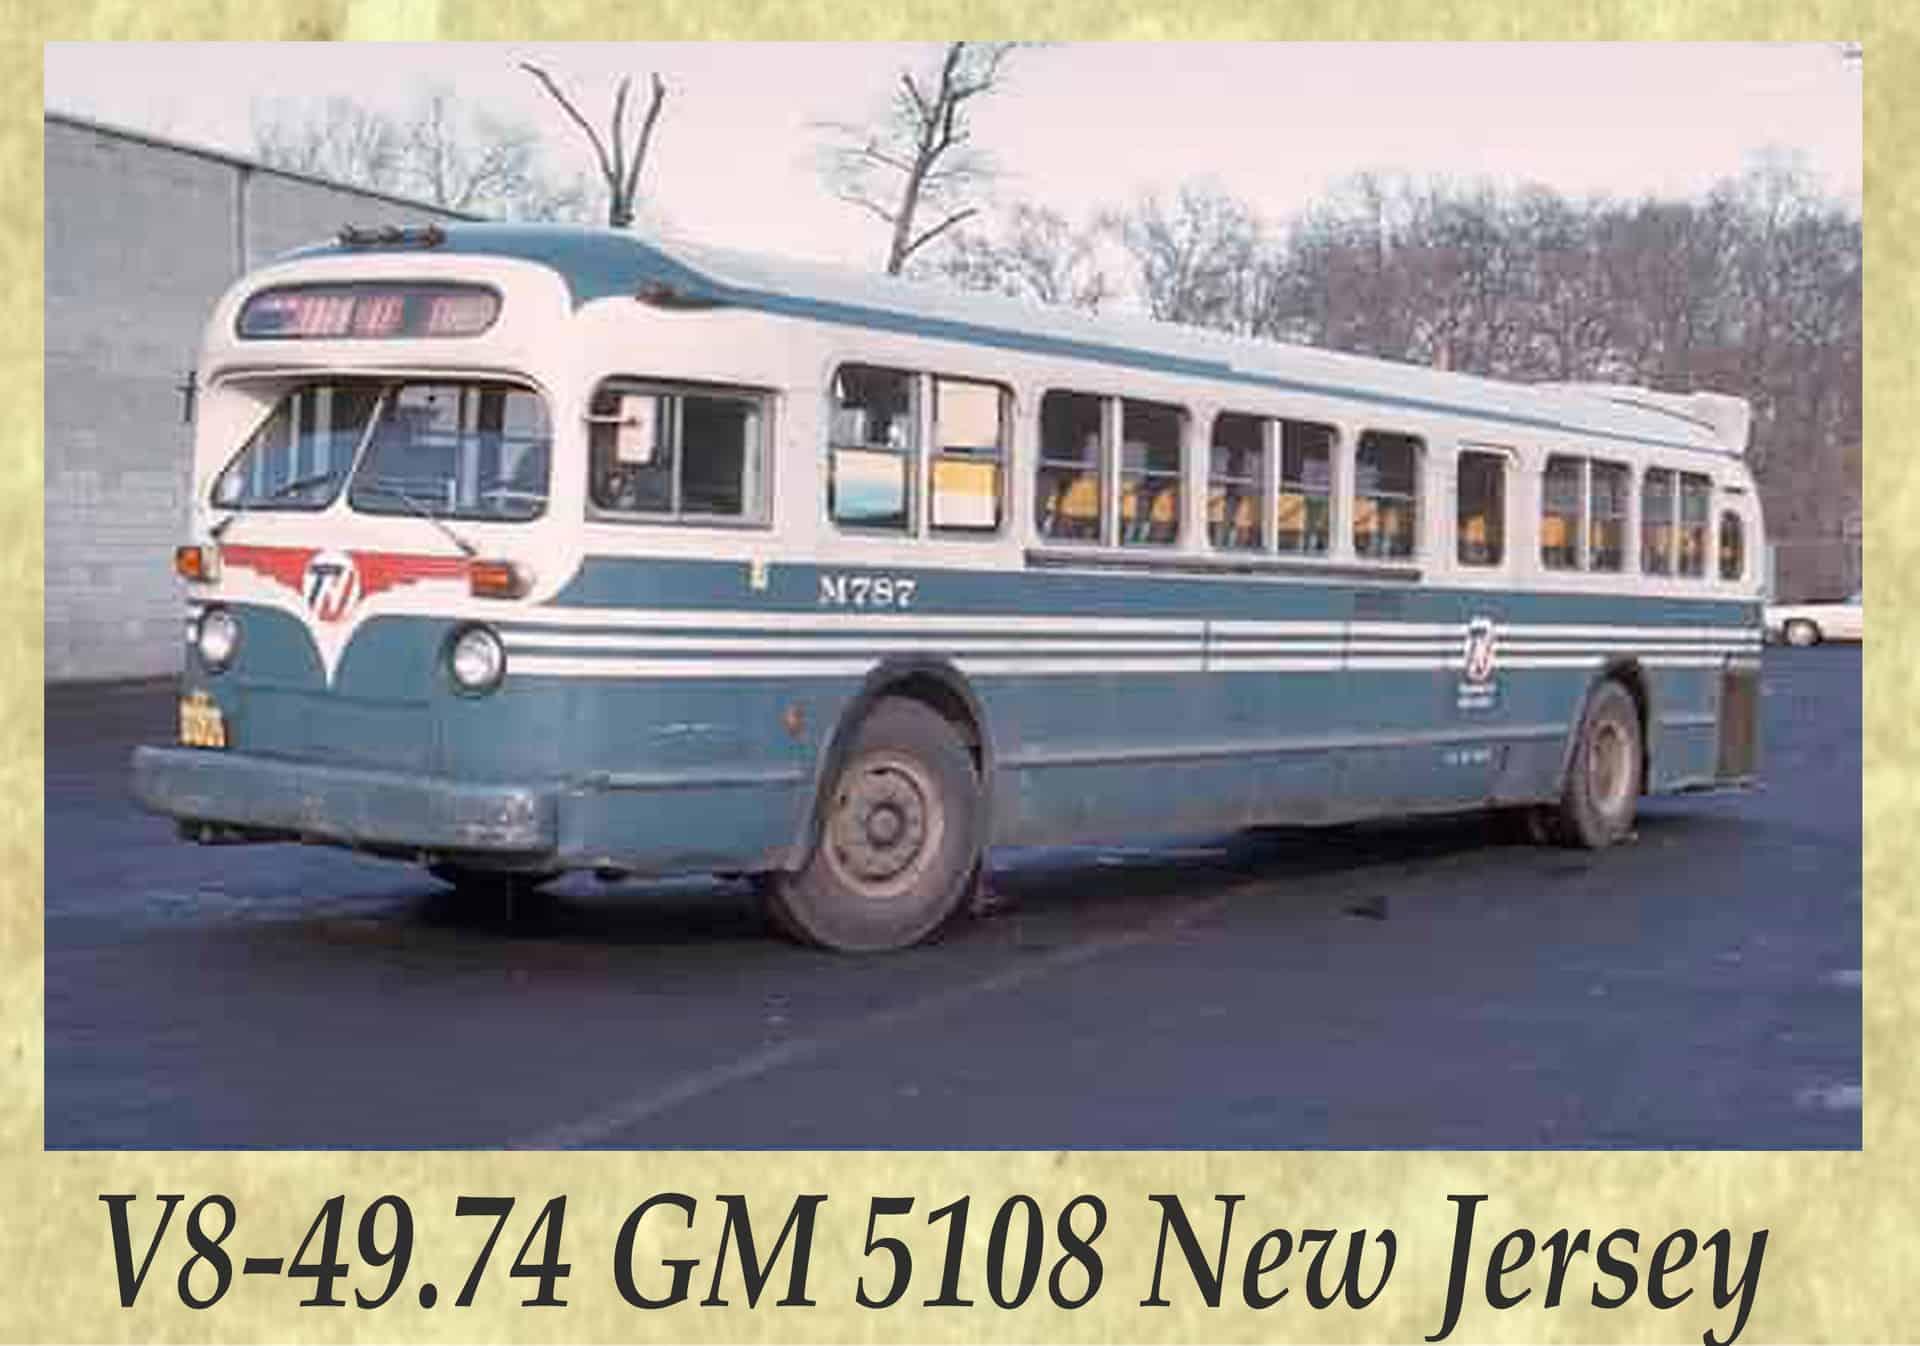 V8-49.74 GM 5108 New Jersey